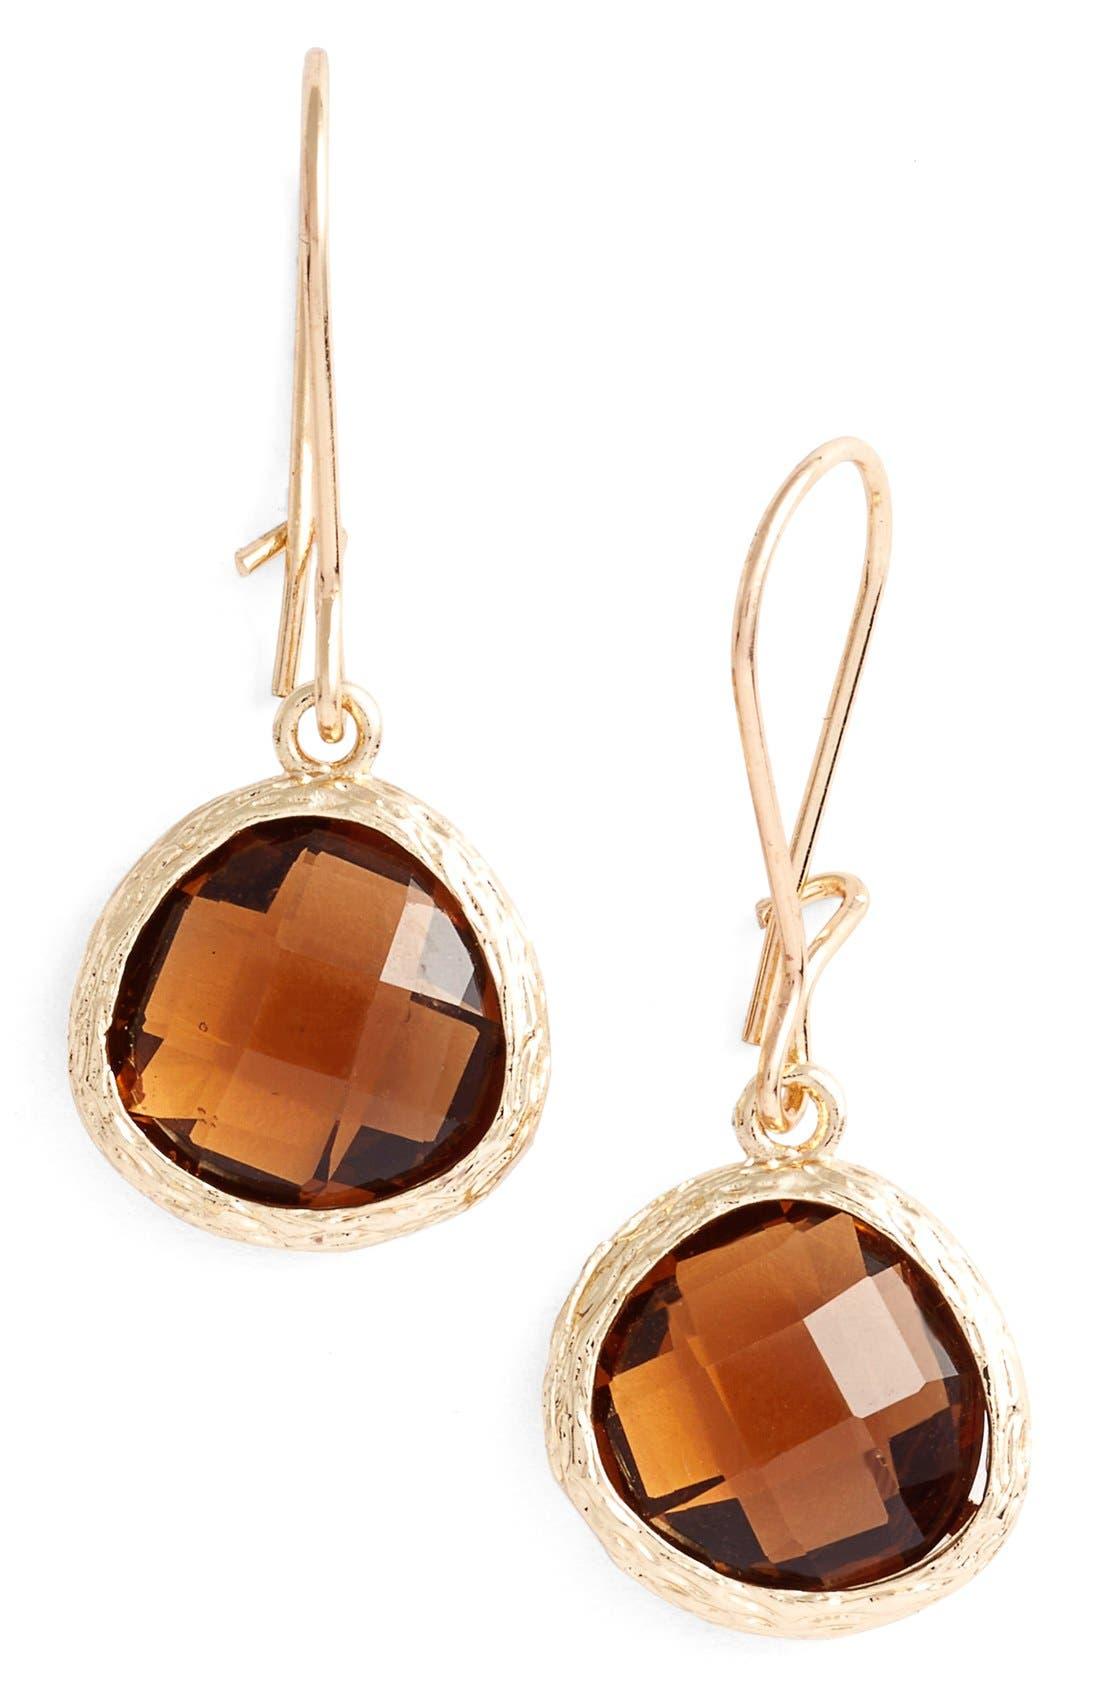 Main Image - Nordstrom Round Drop Earrings